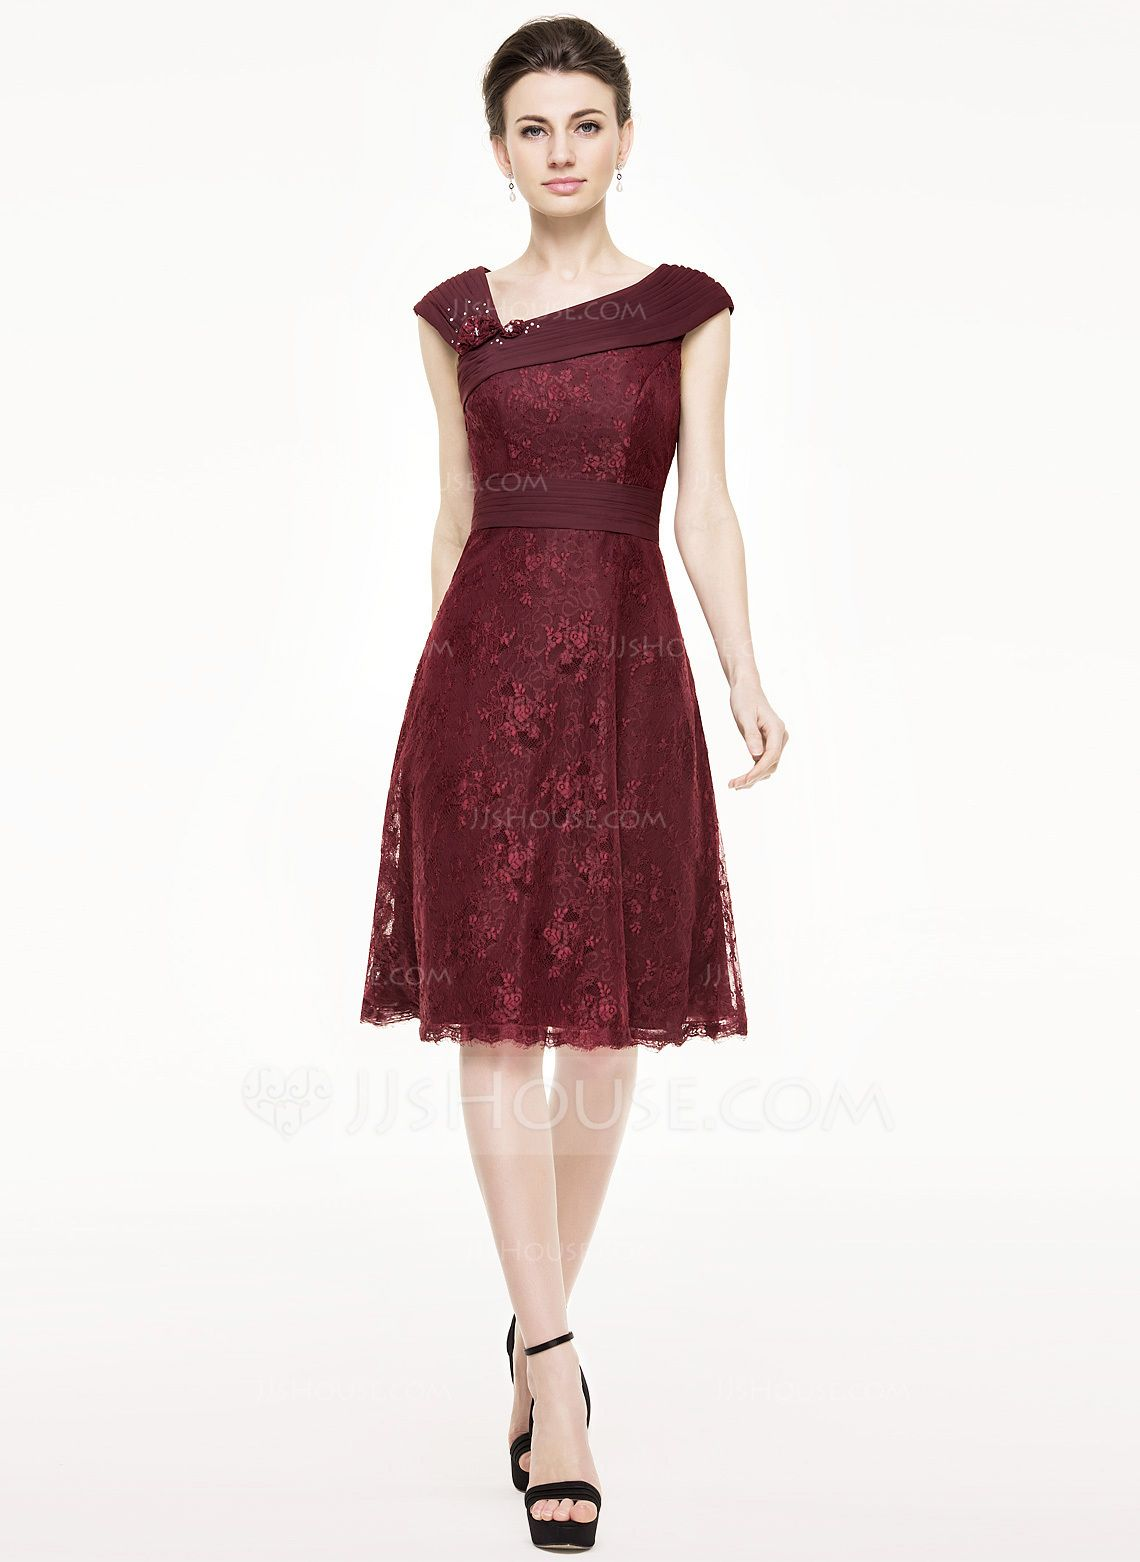 A-Linie/Princess-Linie Knielang Chiffon Spitze Kleid für die